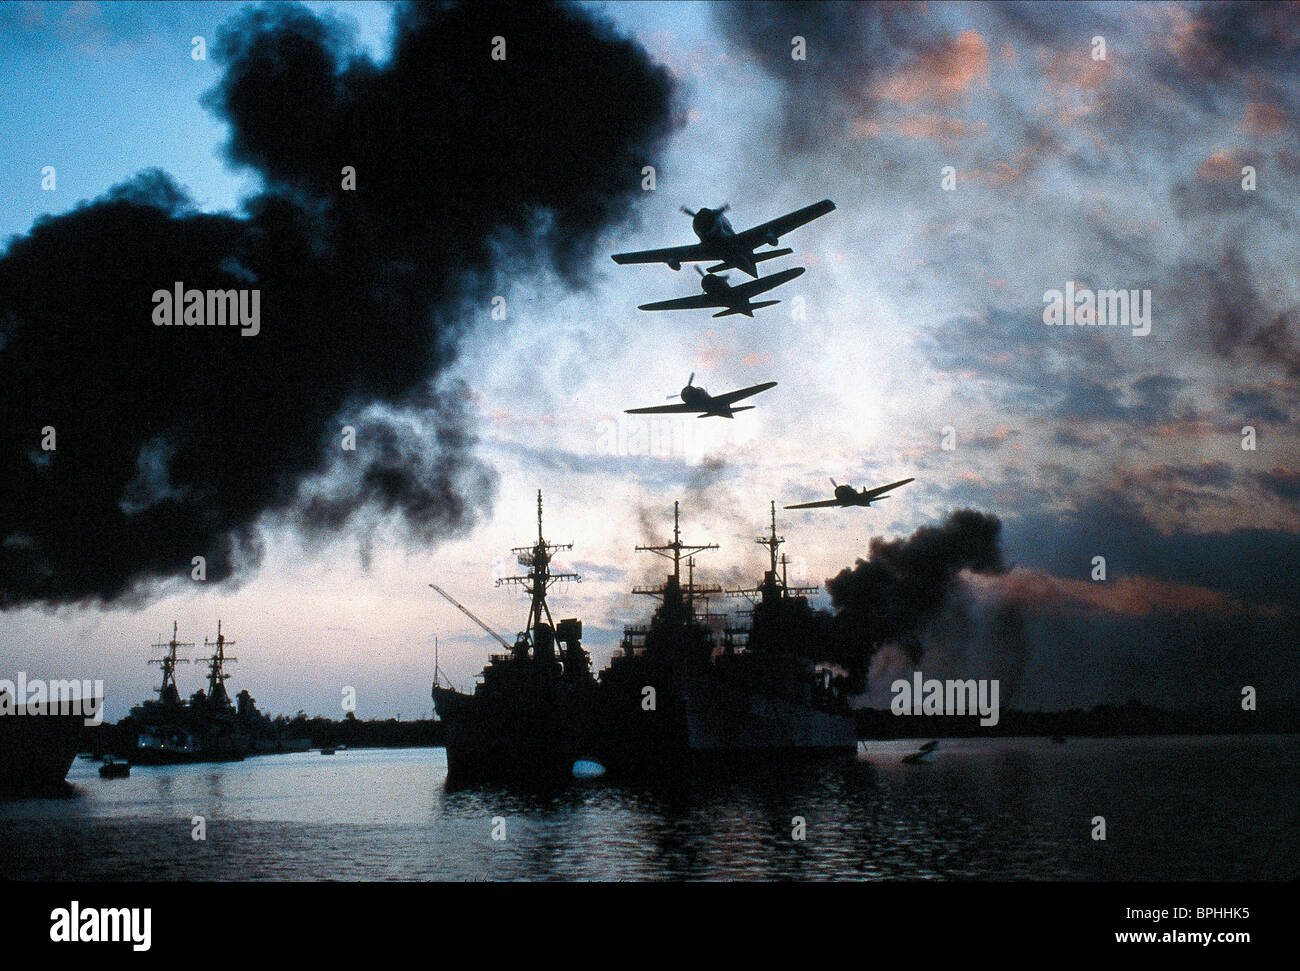 Japanese Attack Scene Pearl Harbour Pearl Harbor 2001 Stock Photo Alamy